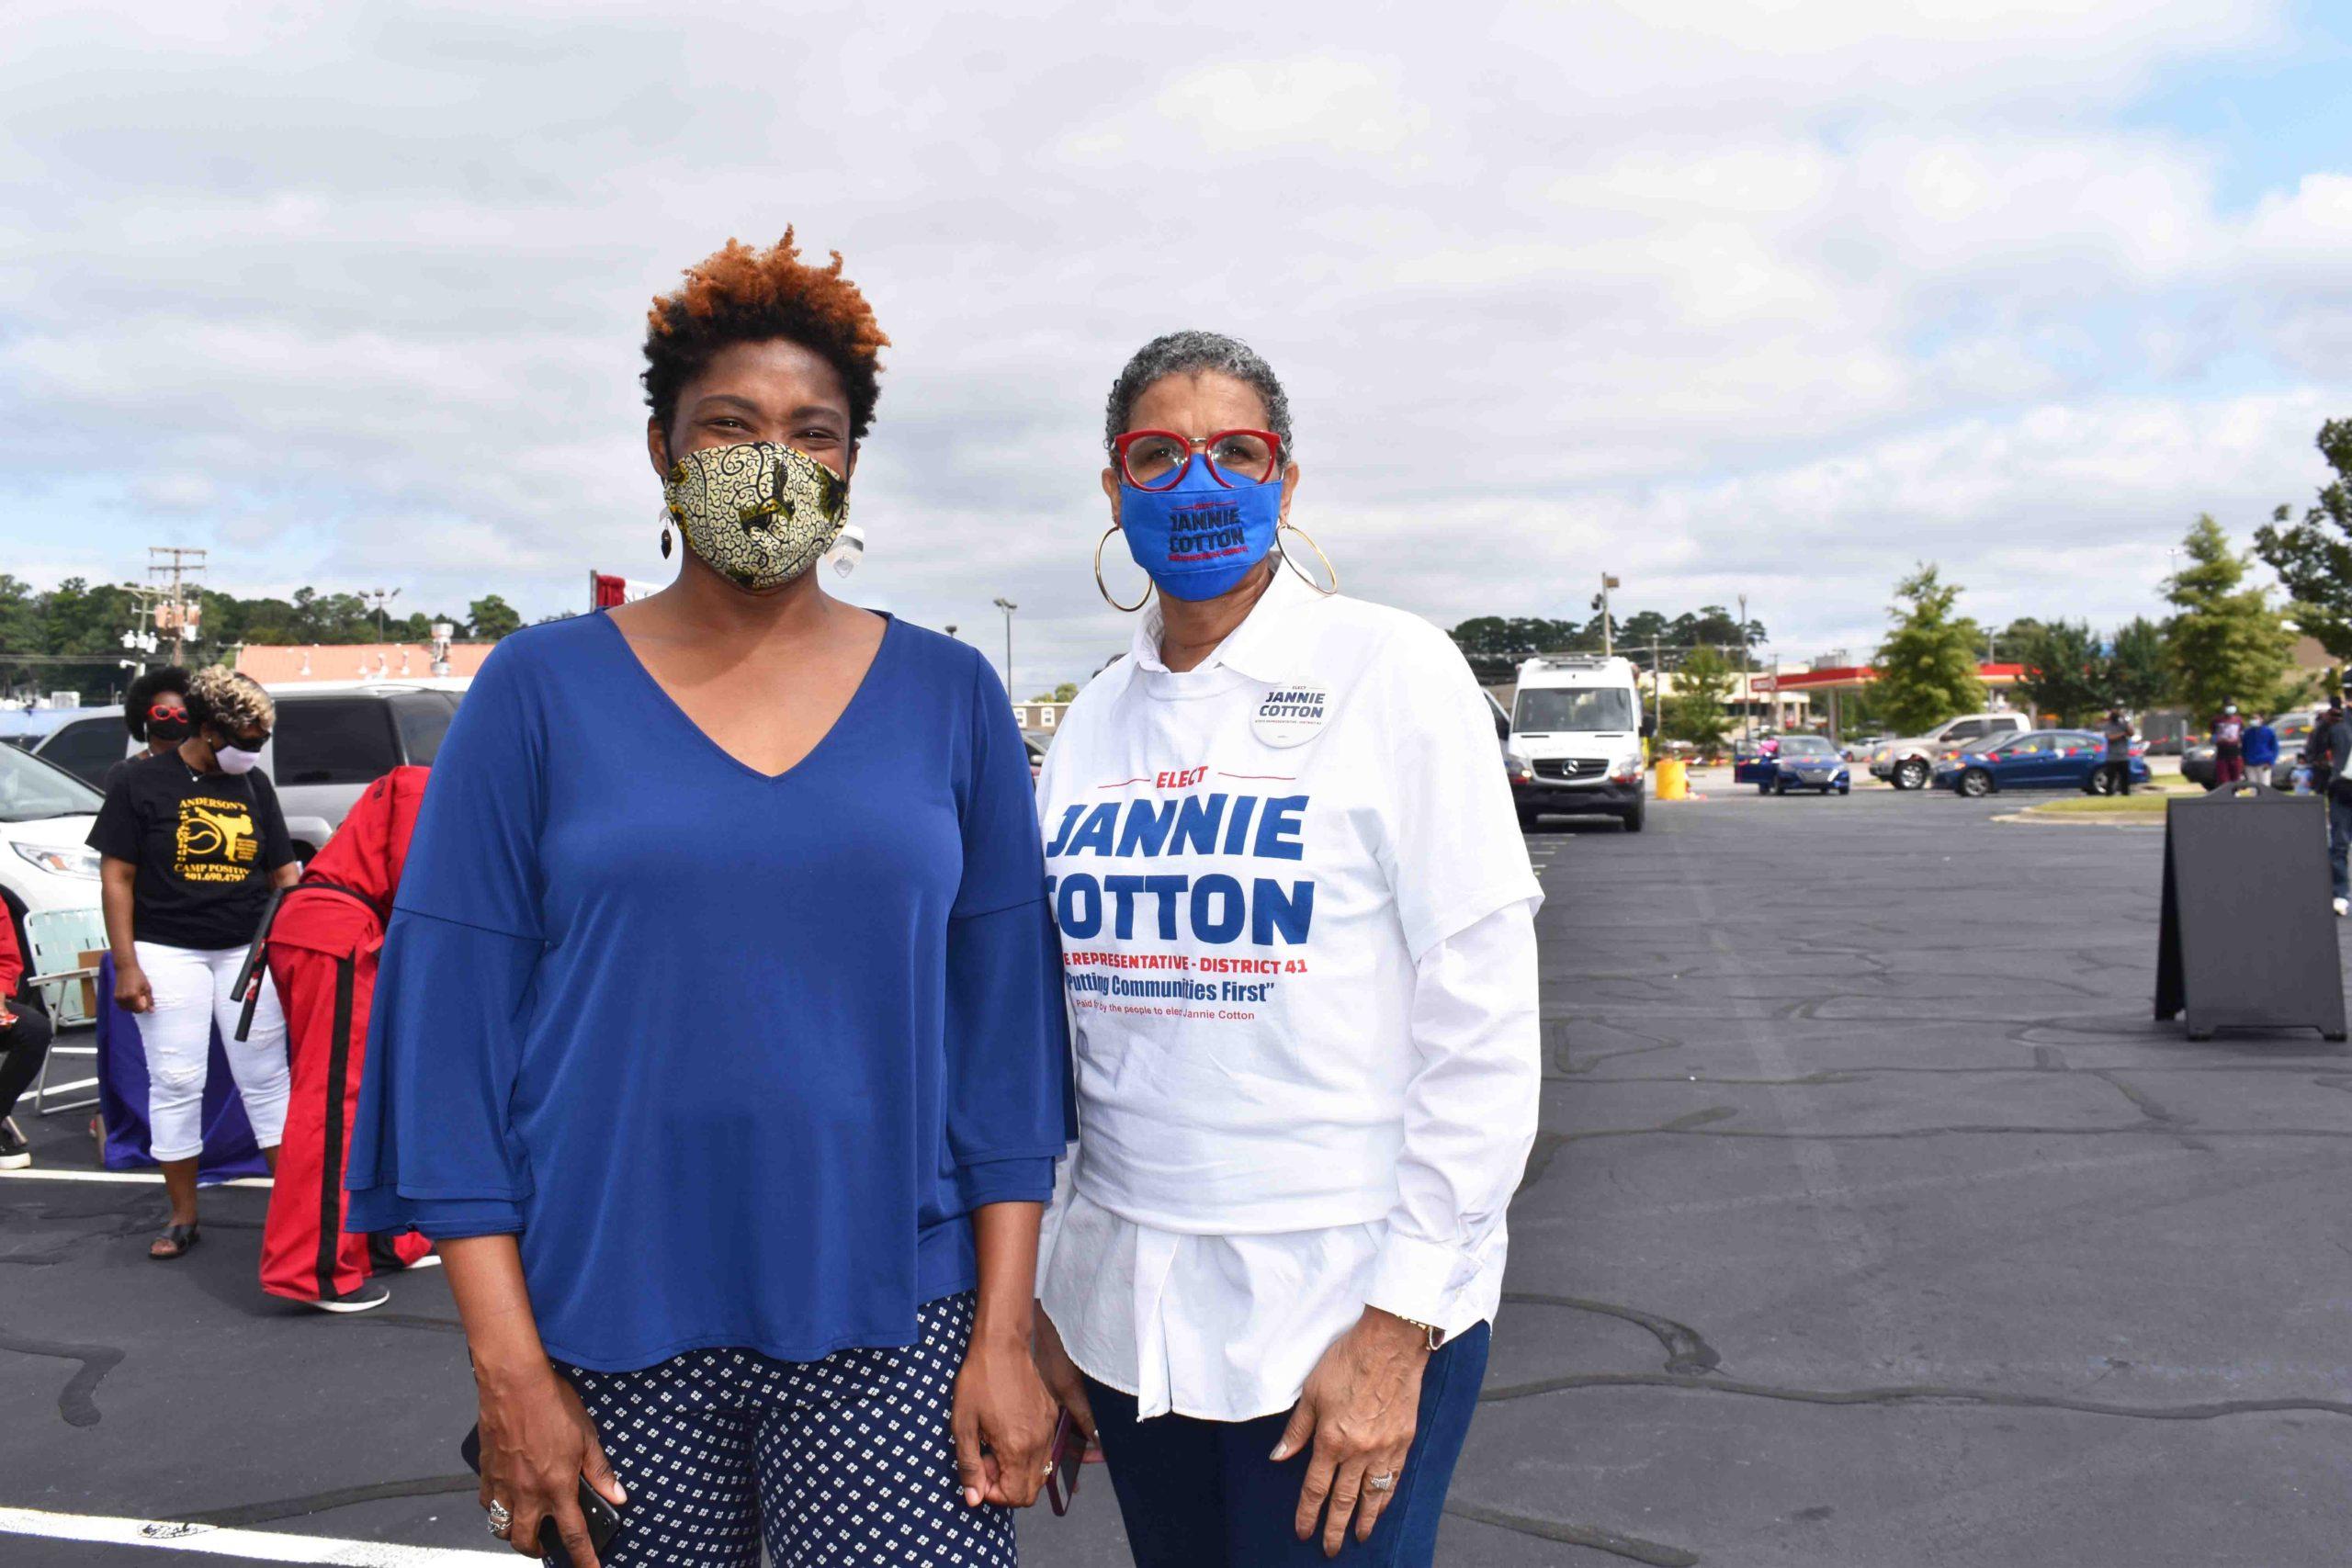 State Rep. Denise Ennett, Janie Cotton